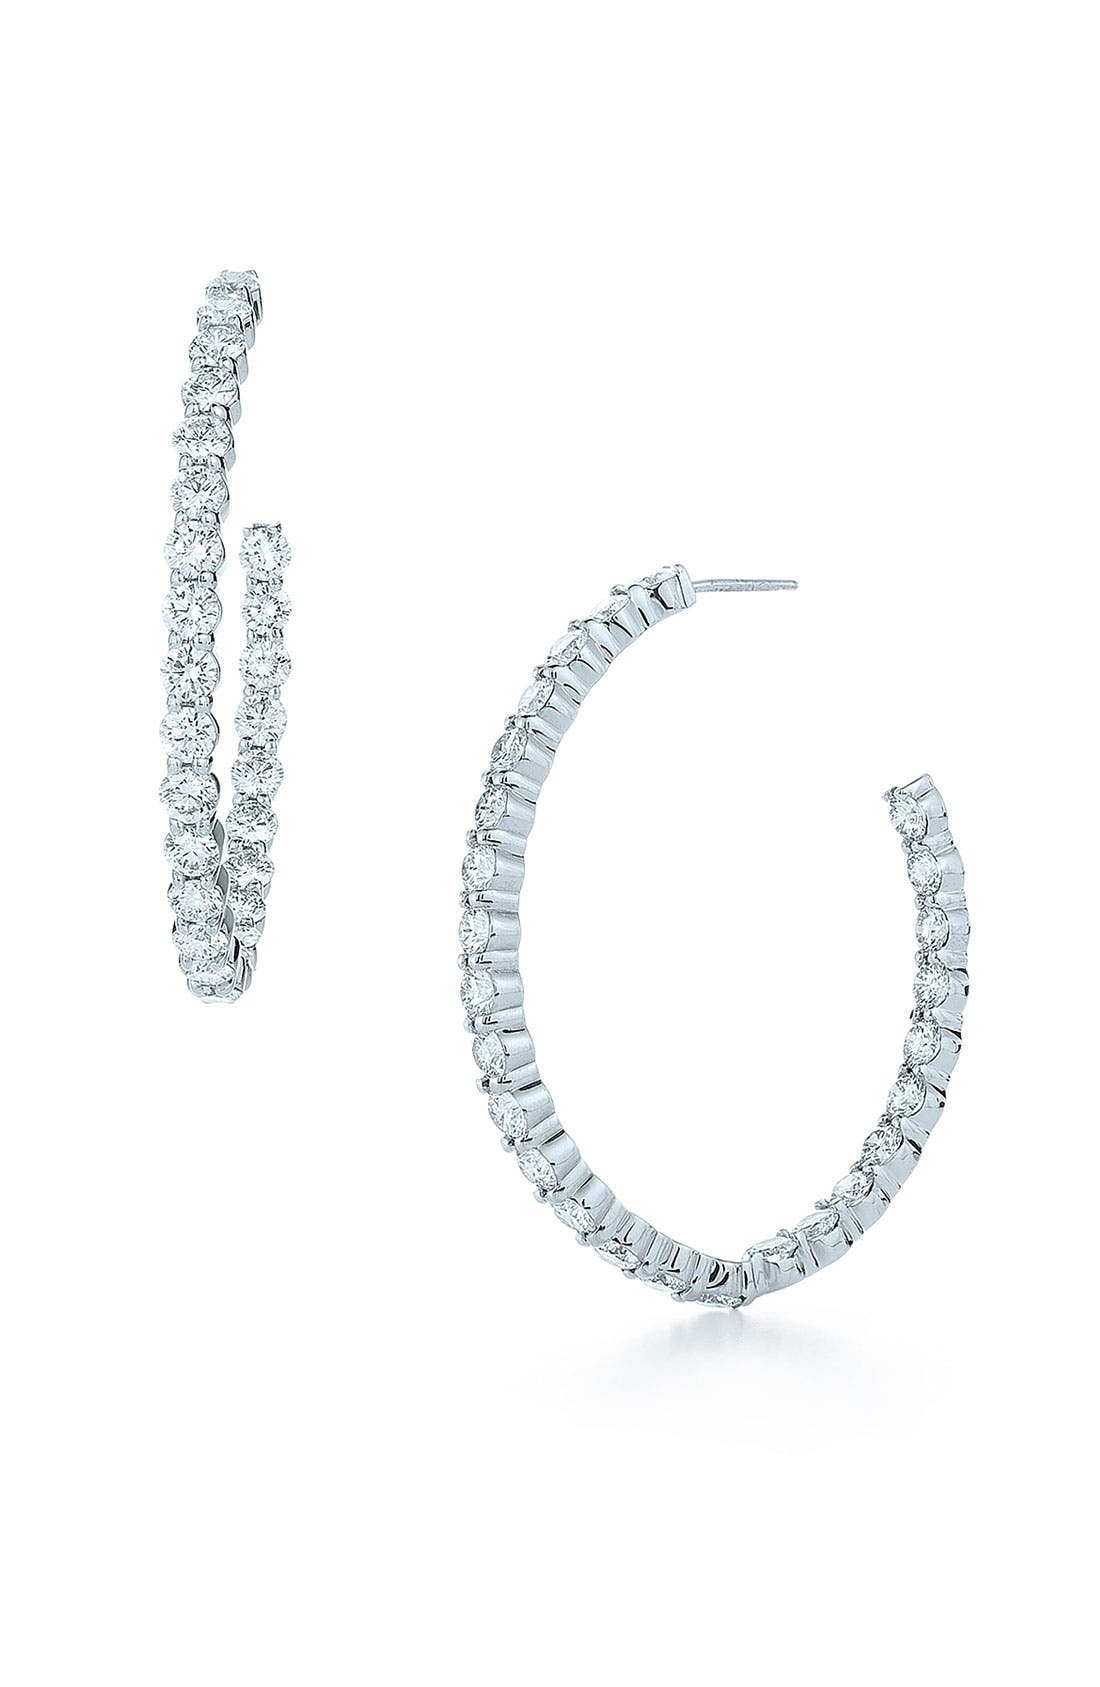 Alternate Image 1 Selected - Kwiat 'Inside Out' Diamond Hoop Earrings